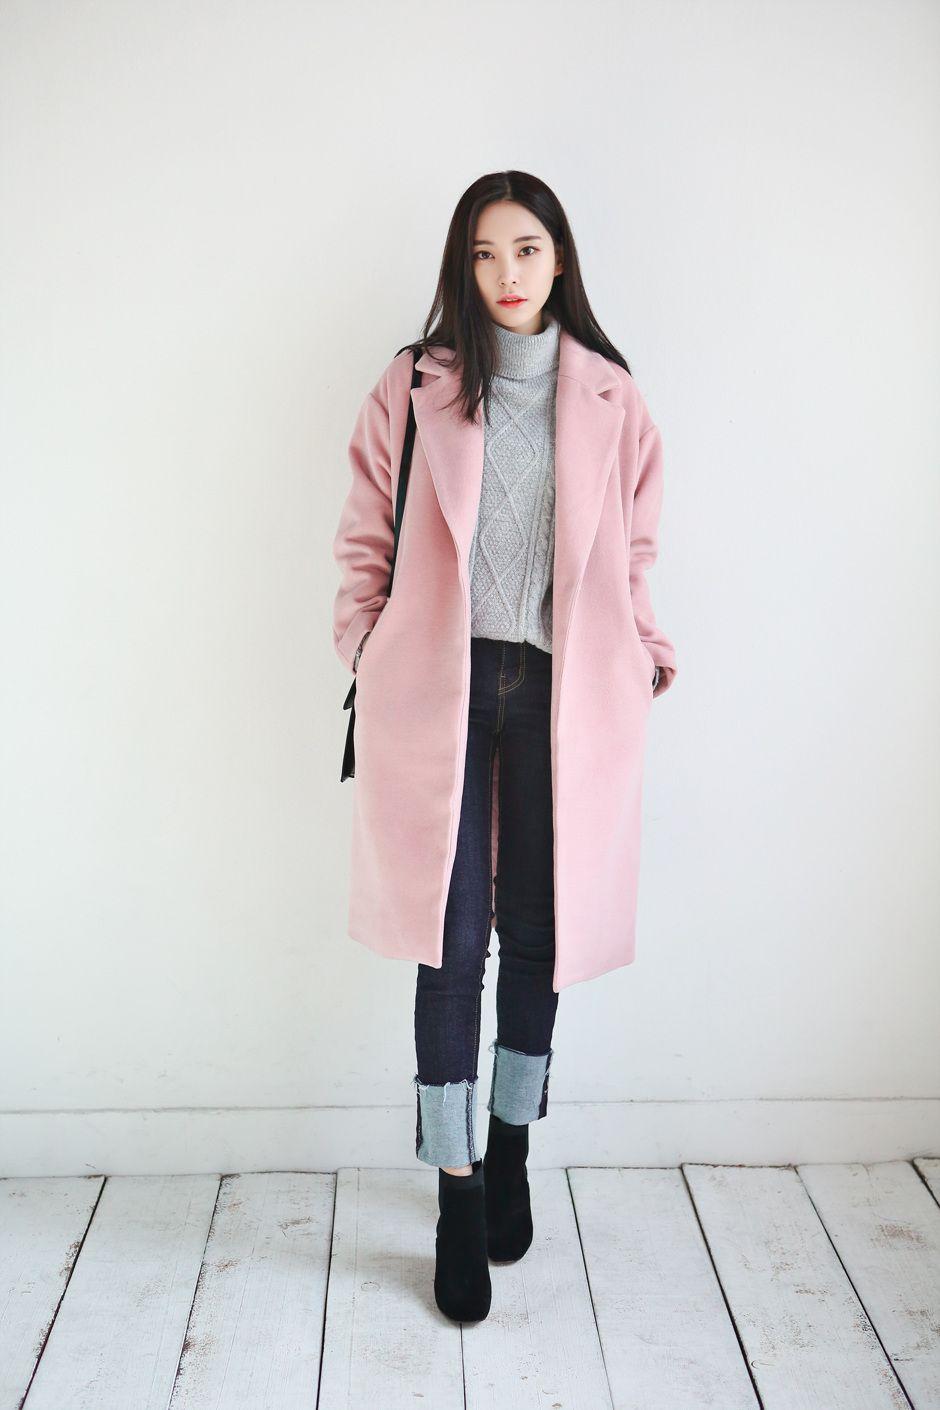 pinterest lauracindysuganda korean fashion and style. Black Bedroom Furniture Sets. Home Design Ideas